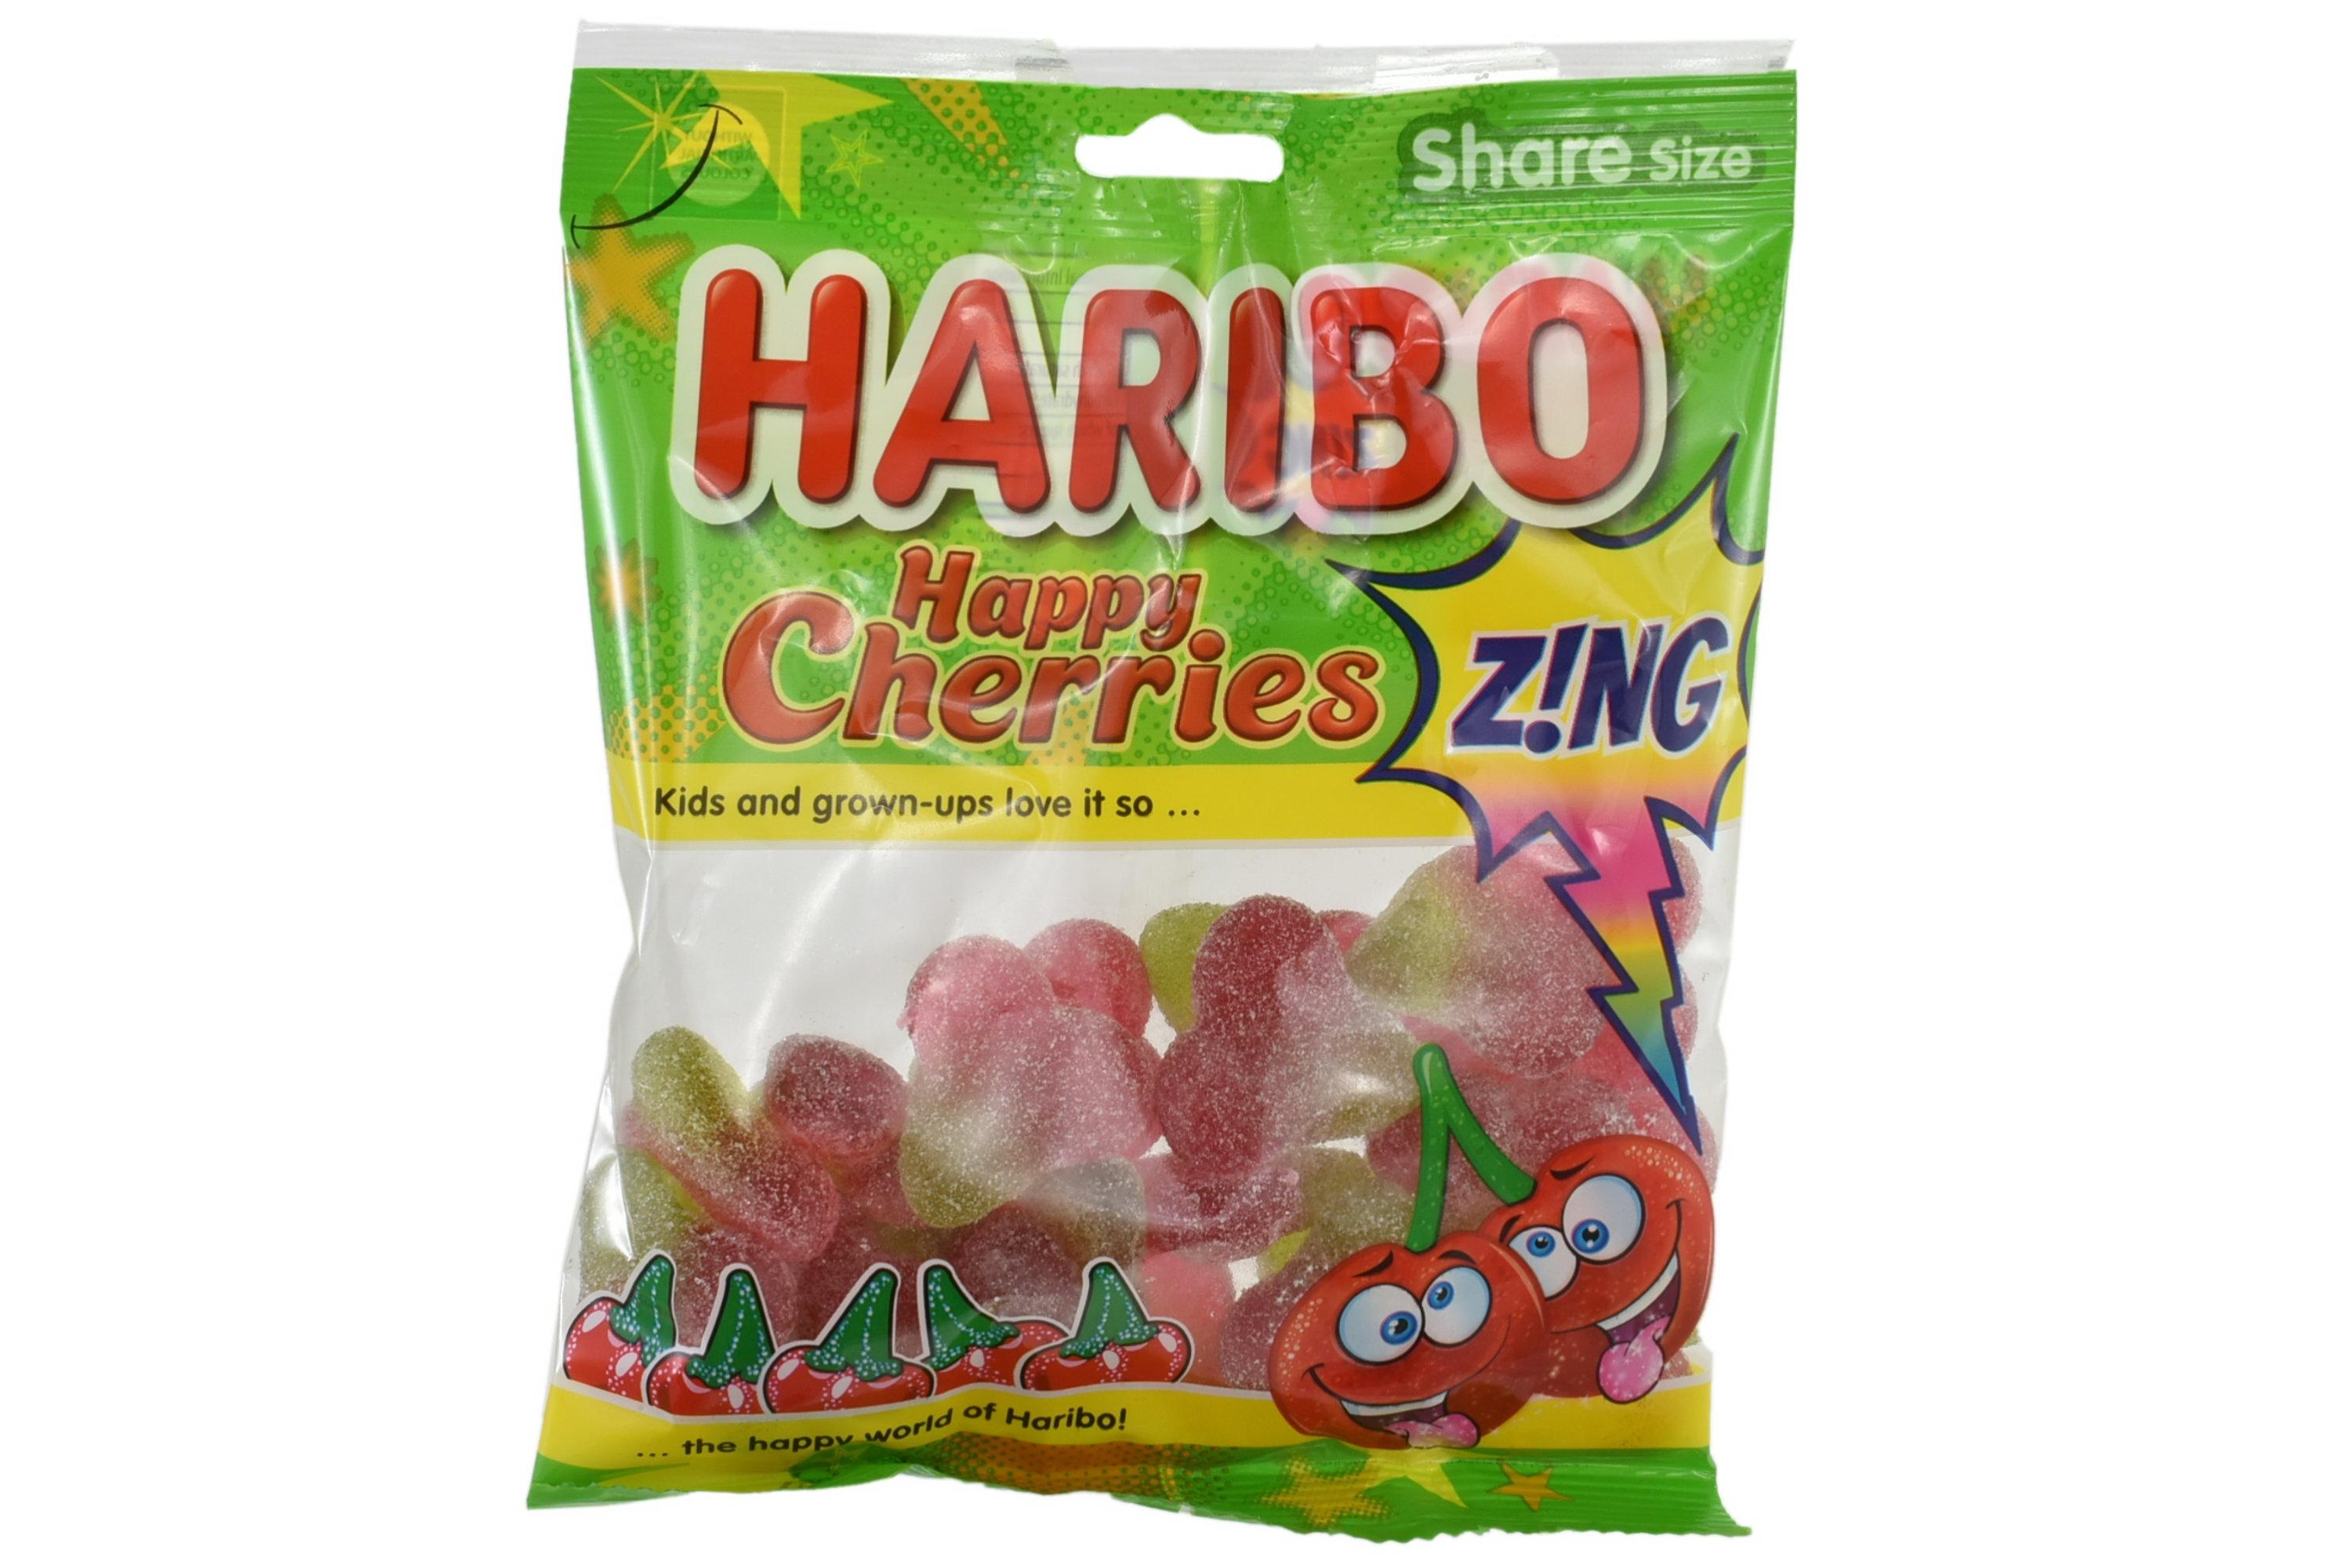 140g Happy Cherries Zing Prepack - Haribo